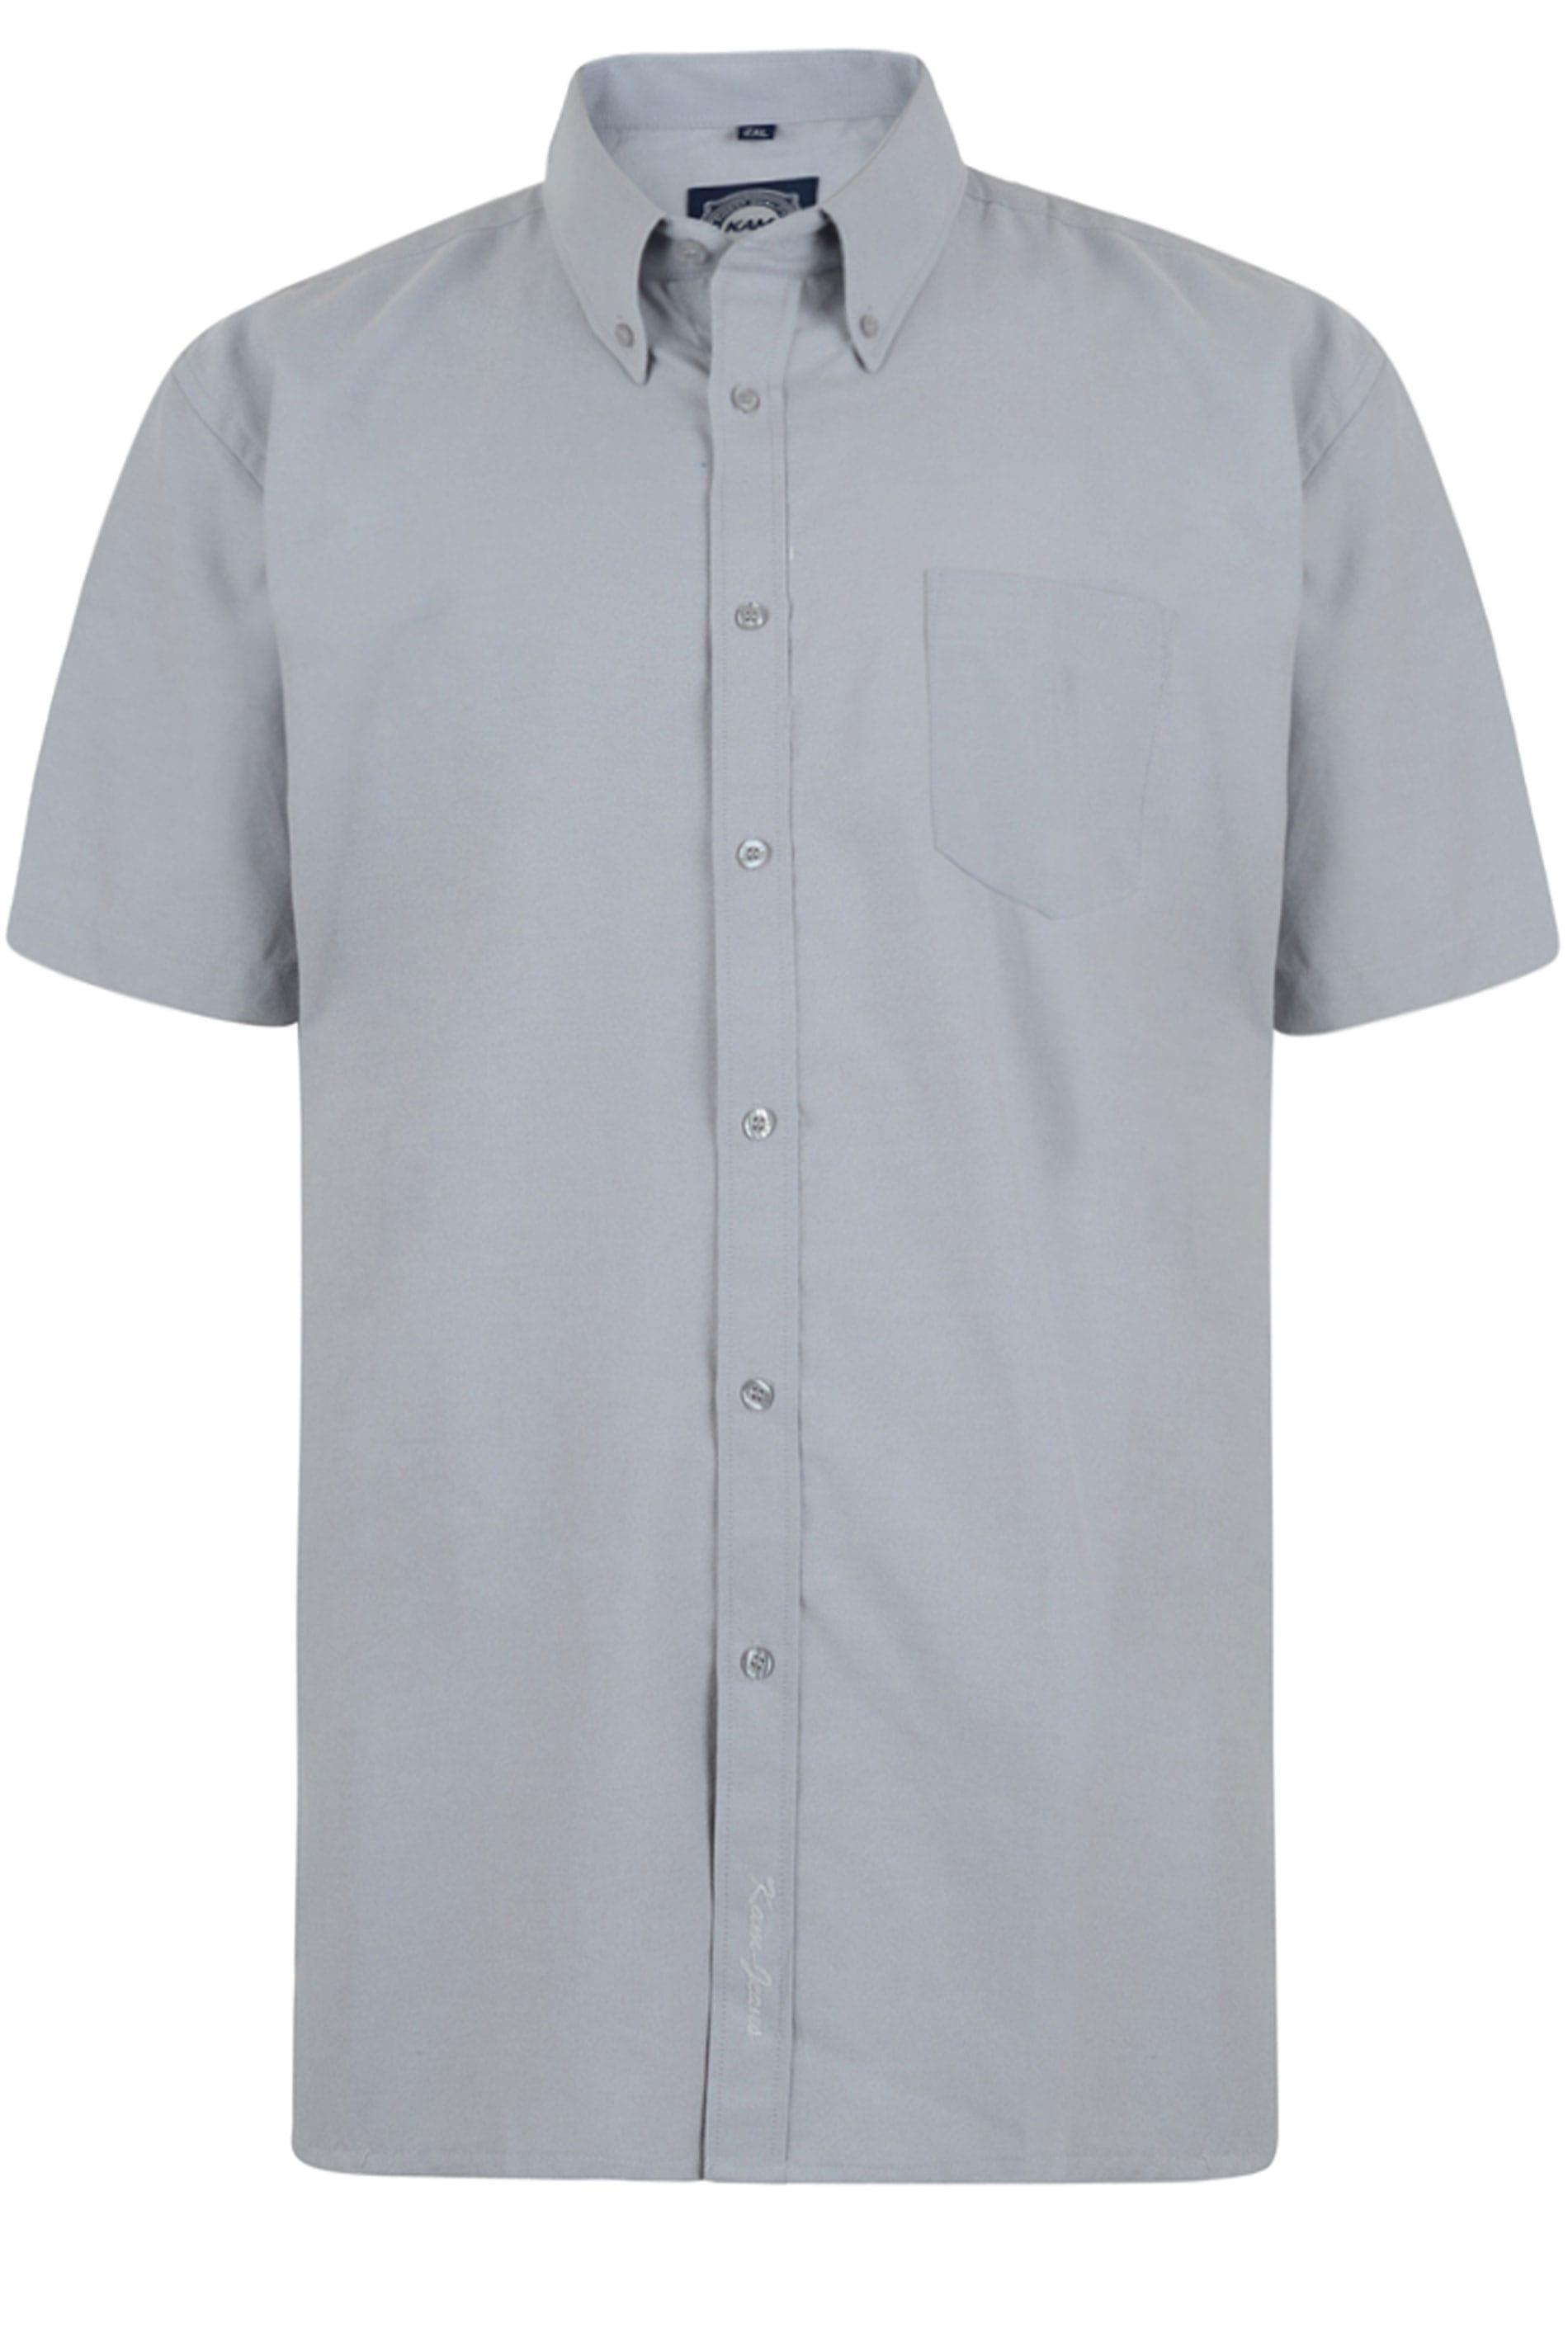 KAM Grey Oxford Short Sleeve Shirt